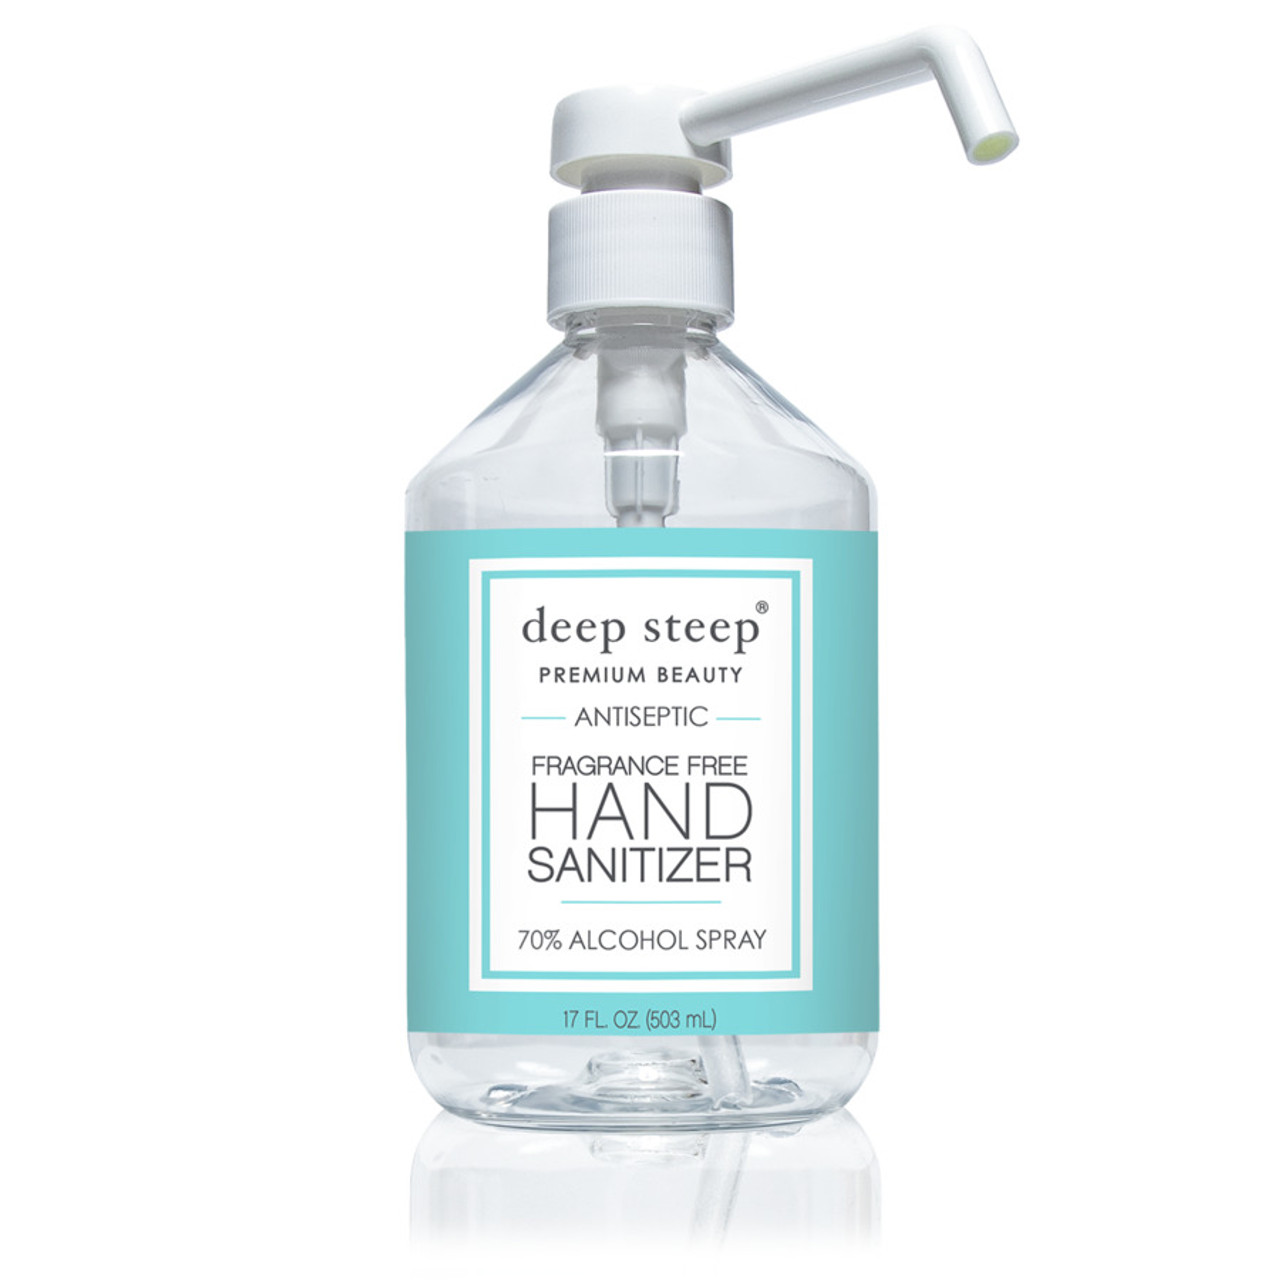 Hand Sanitizer Spray, Fragrance Free - 17.5fl oz. - 70% Alcohol - Front